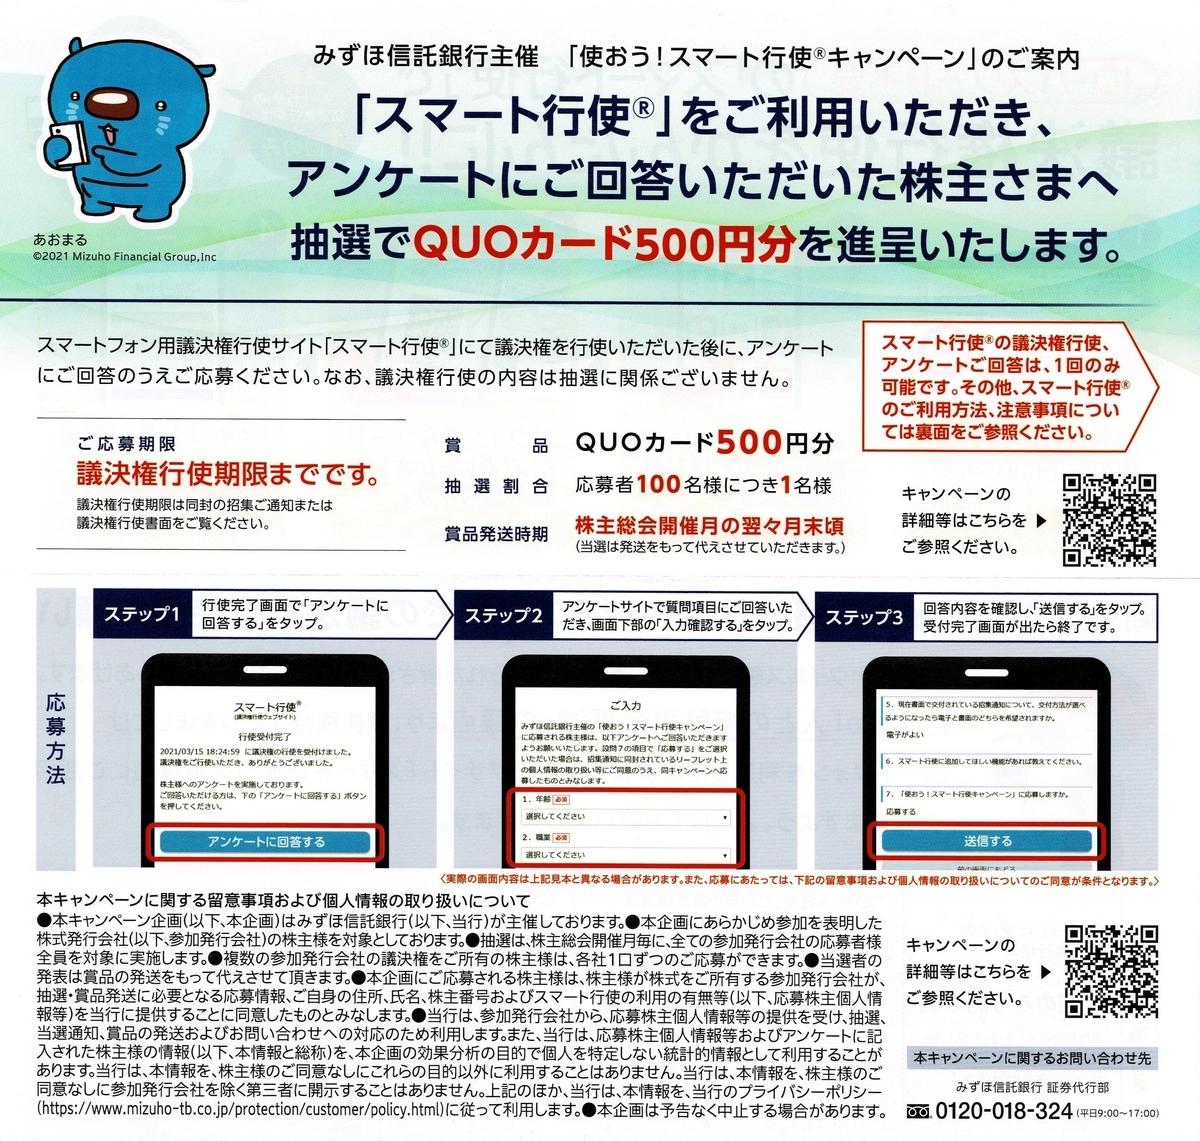 f:id:hanayamatoro:20210616094951j:plain